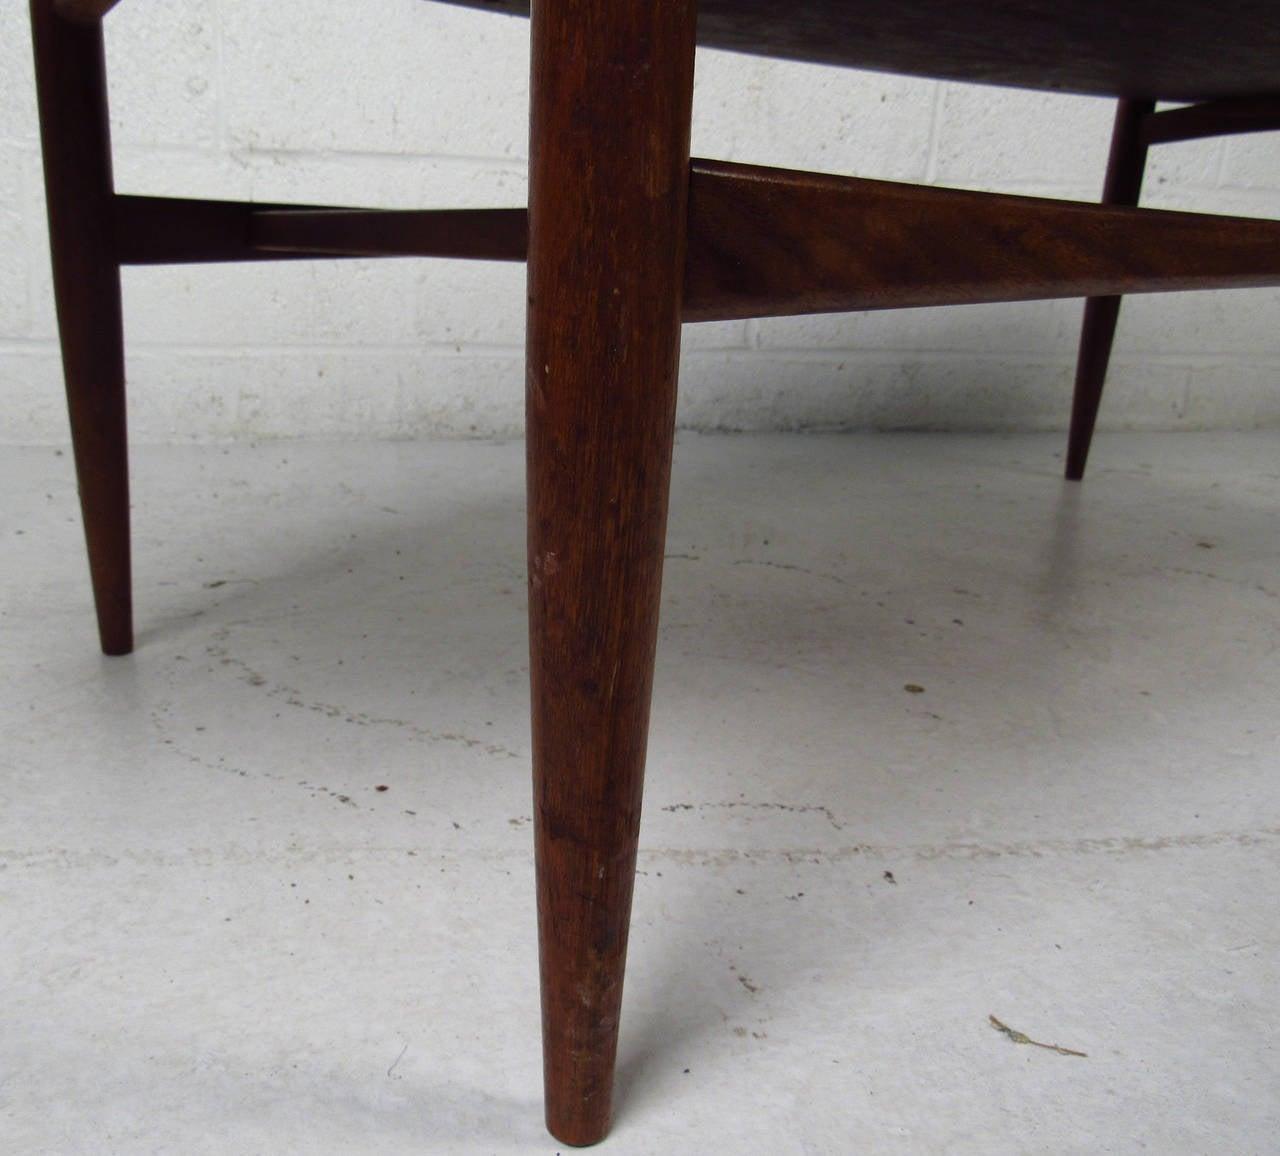 American Scandinavian Modern Surfboard Coffee Table With Shelf For Sale